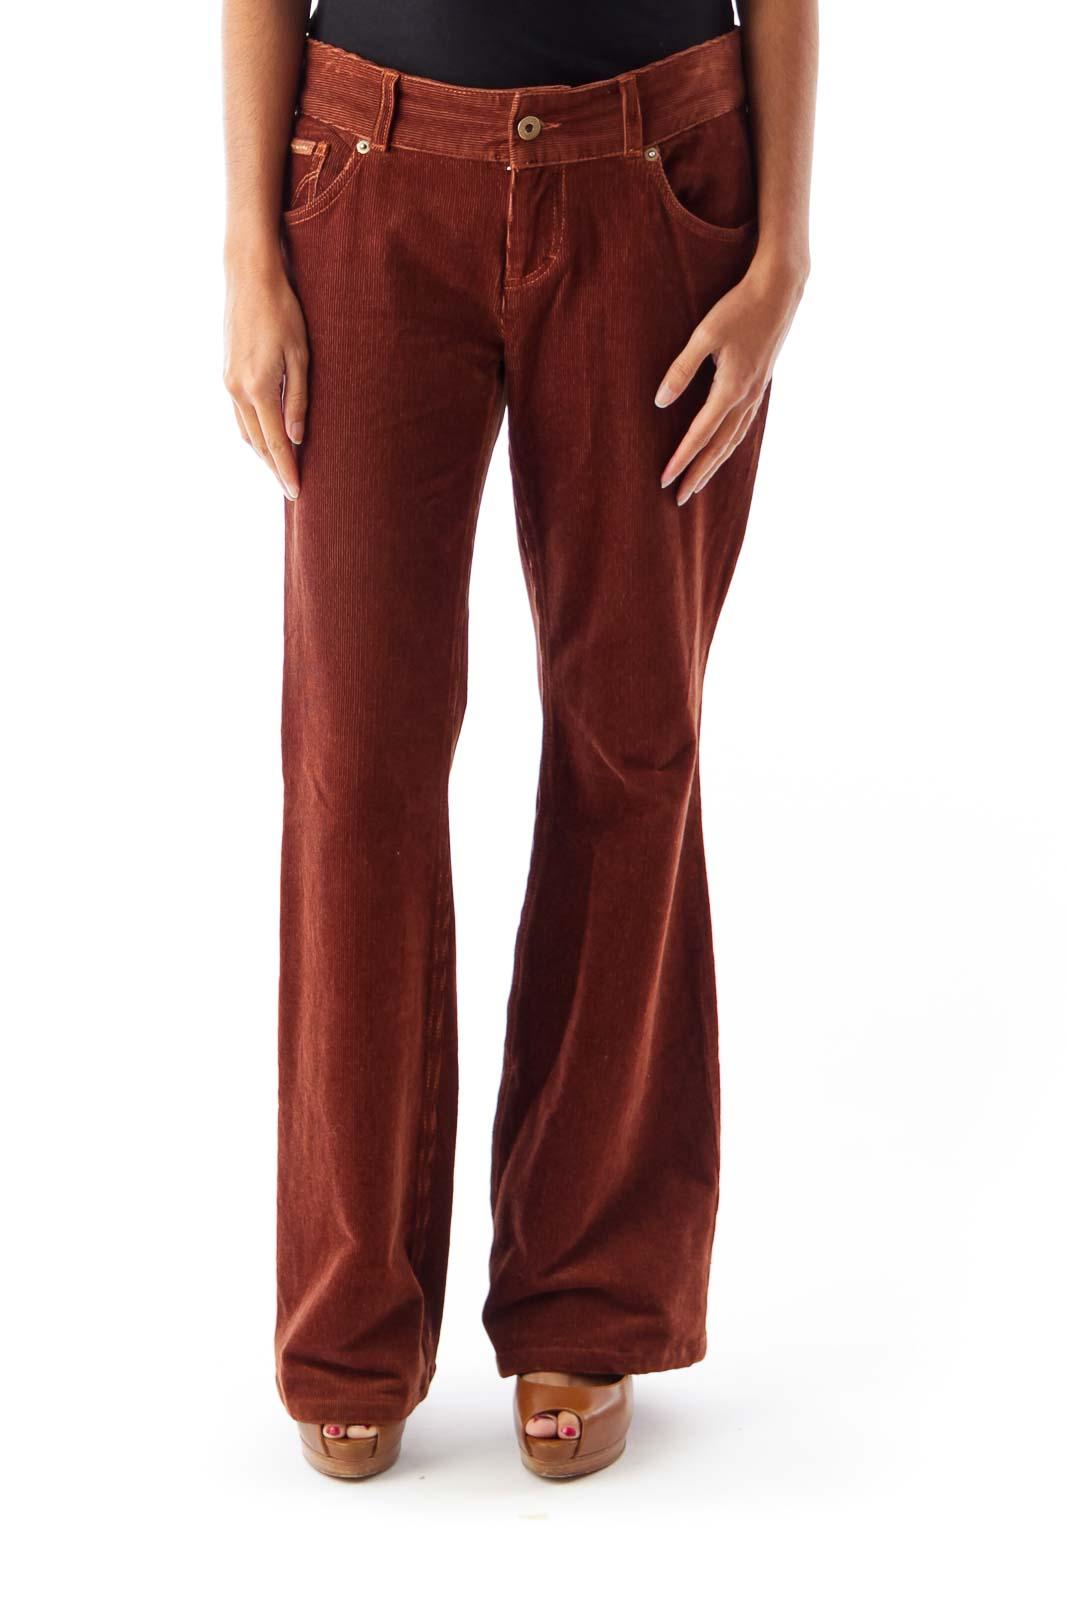 Brown Corduroy Flare Pants